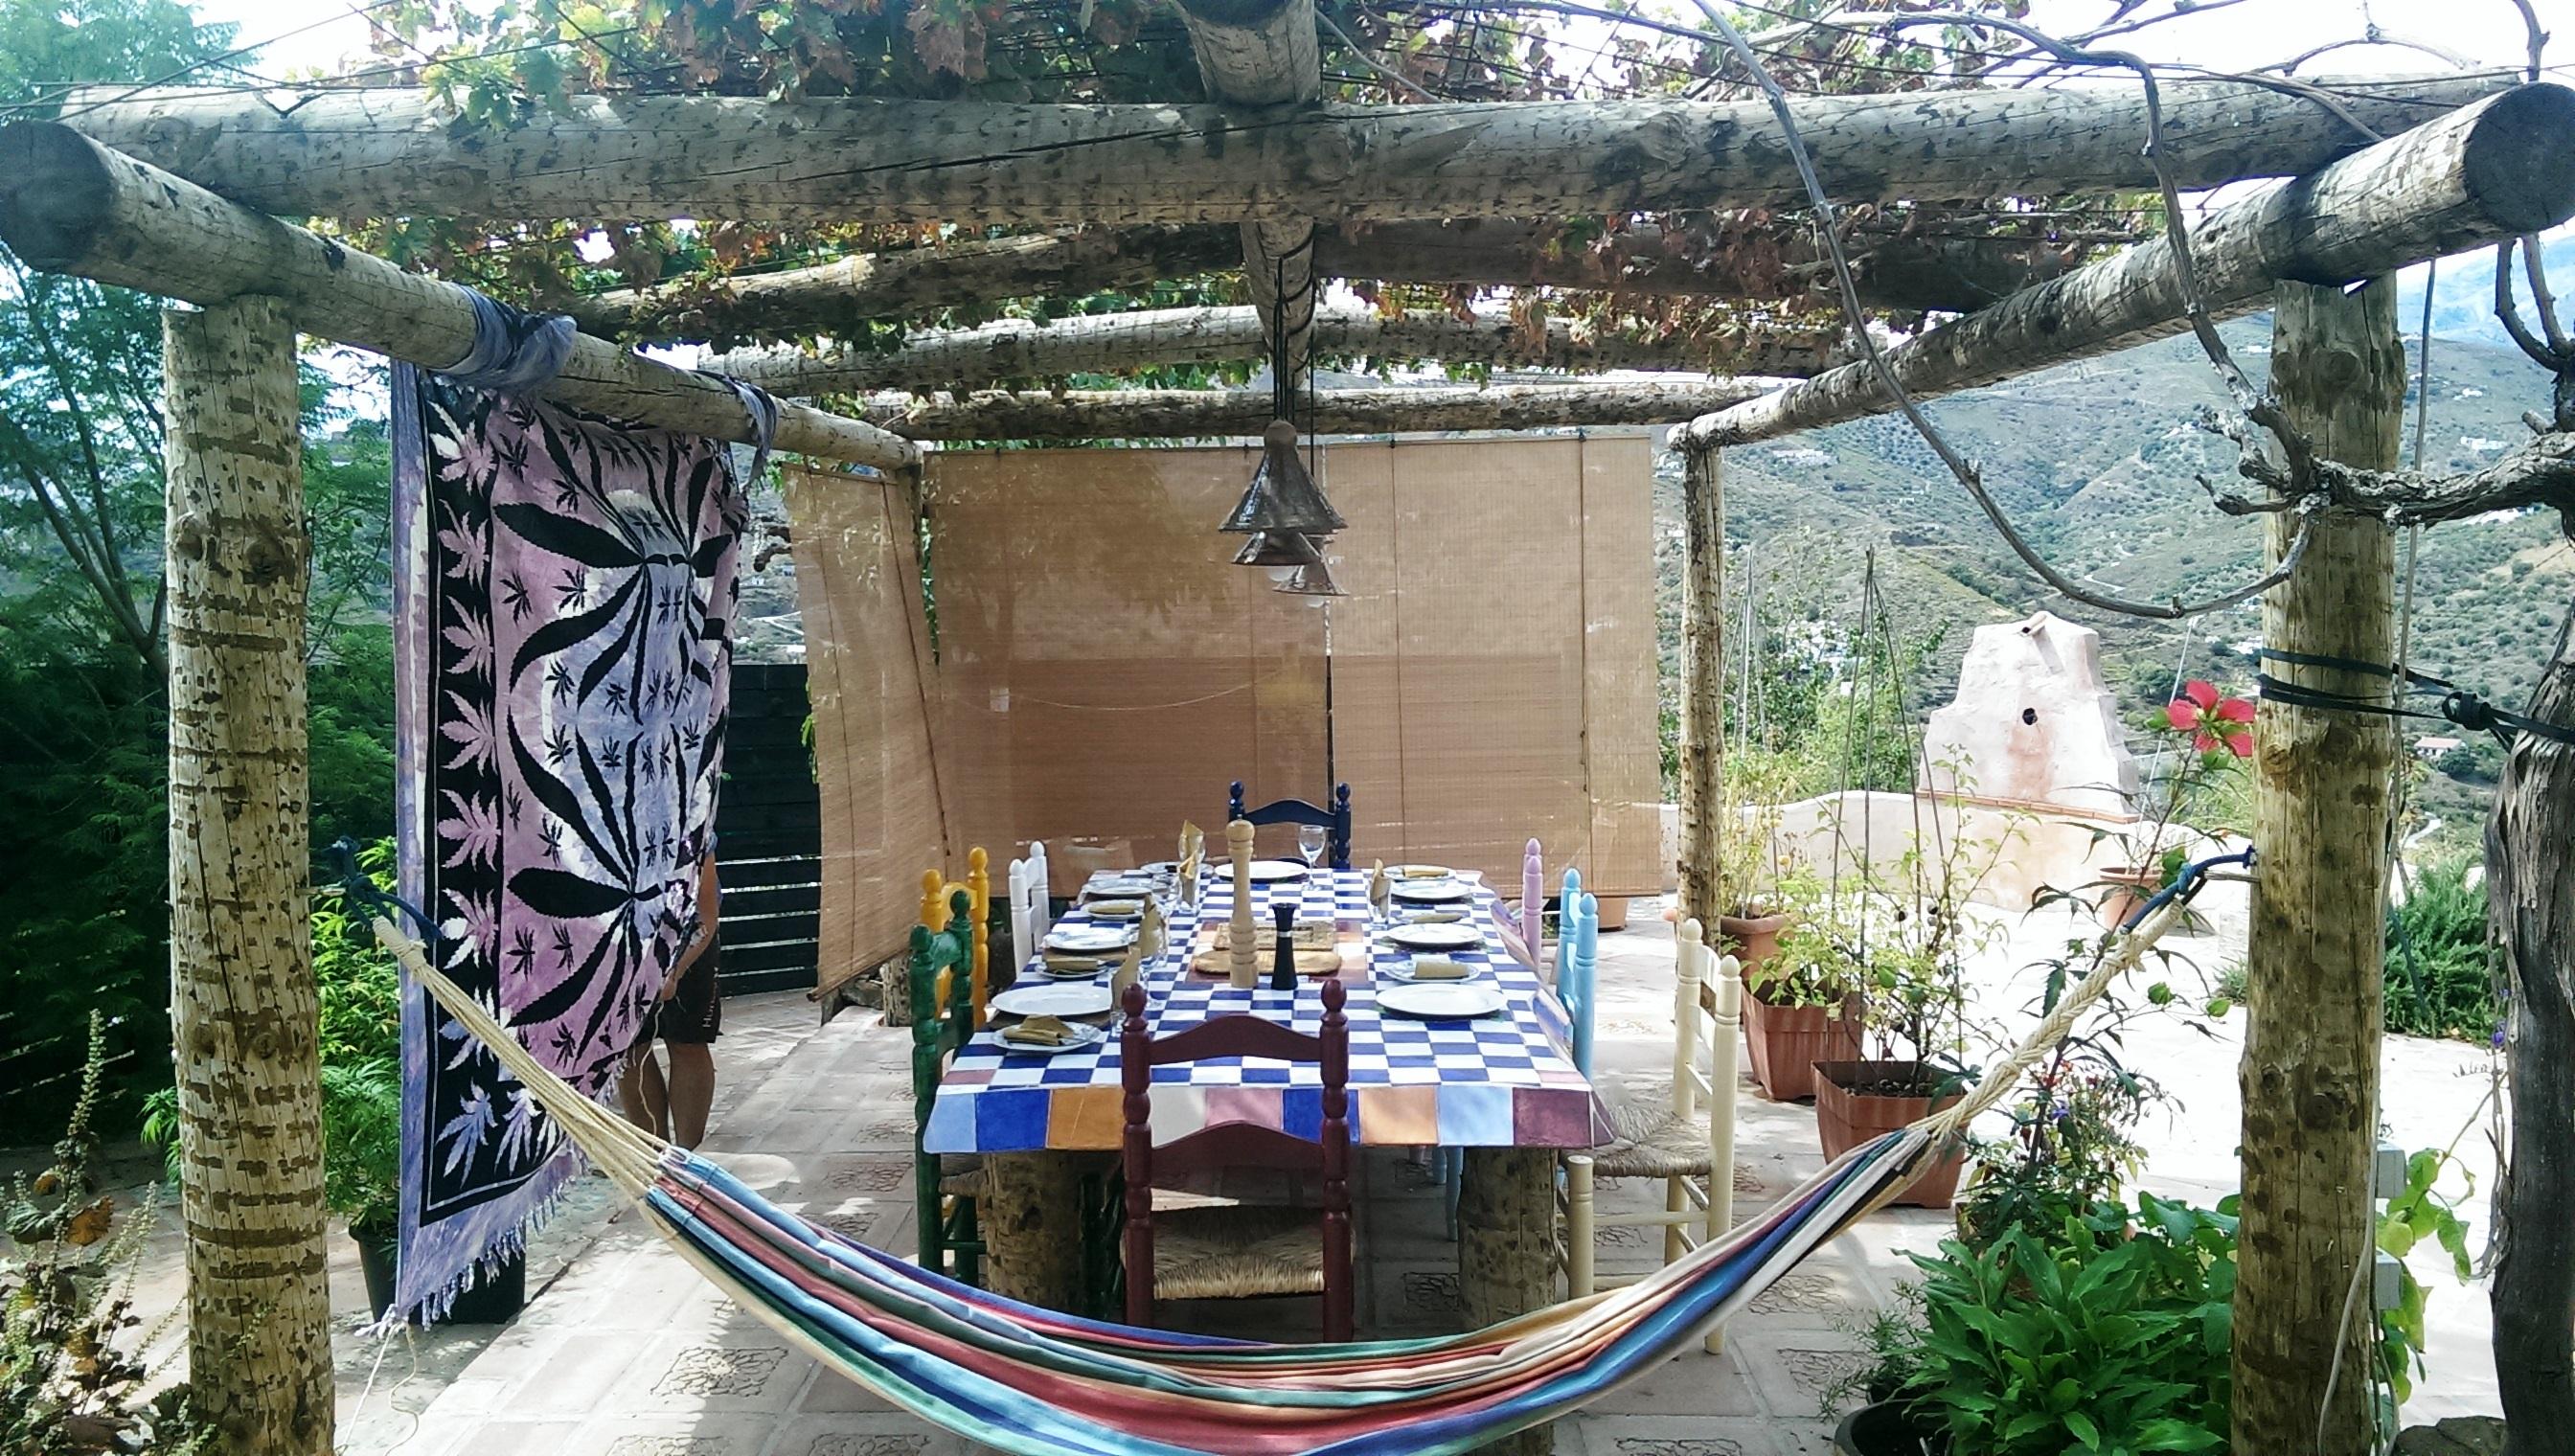 Pergola & Table - Pergola y mesa